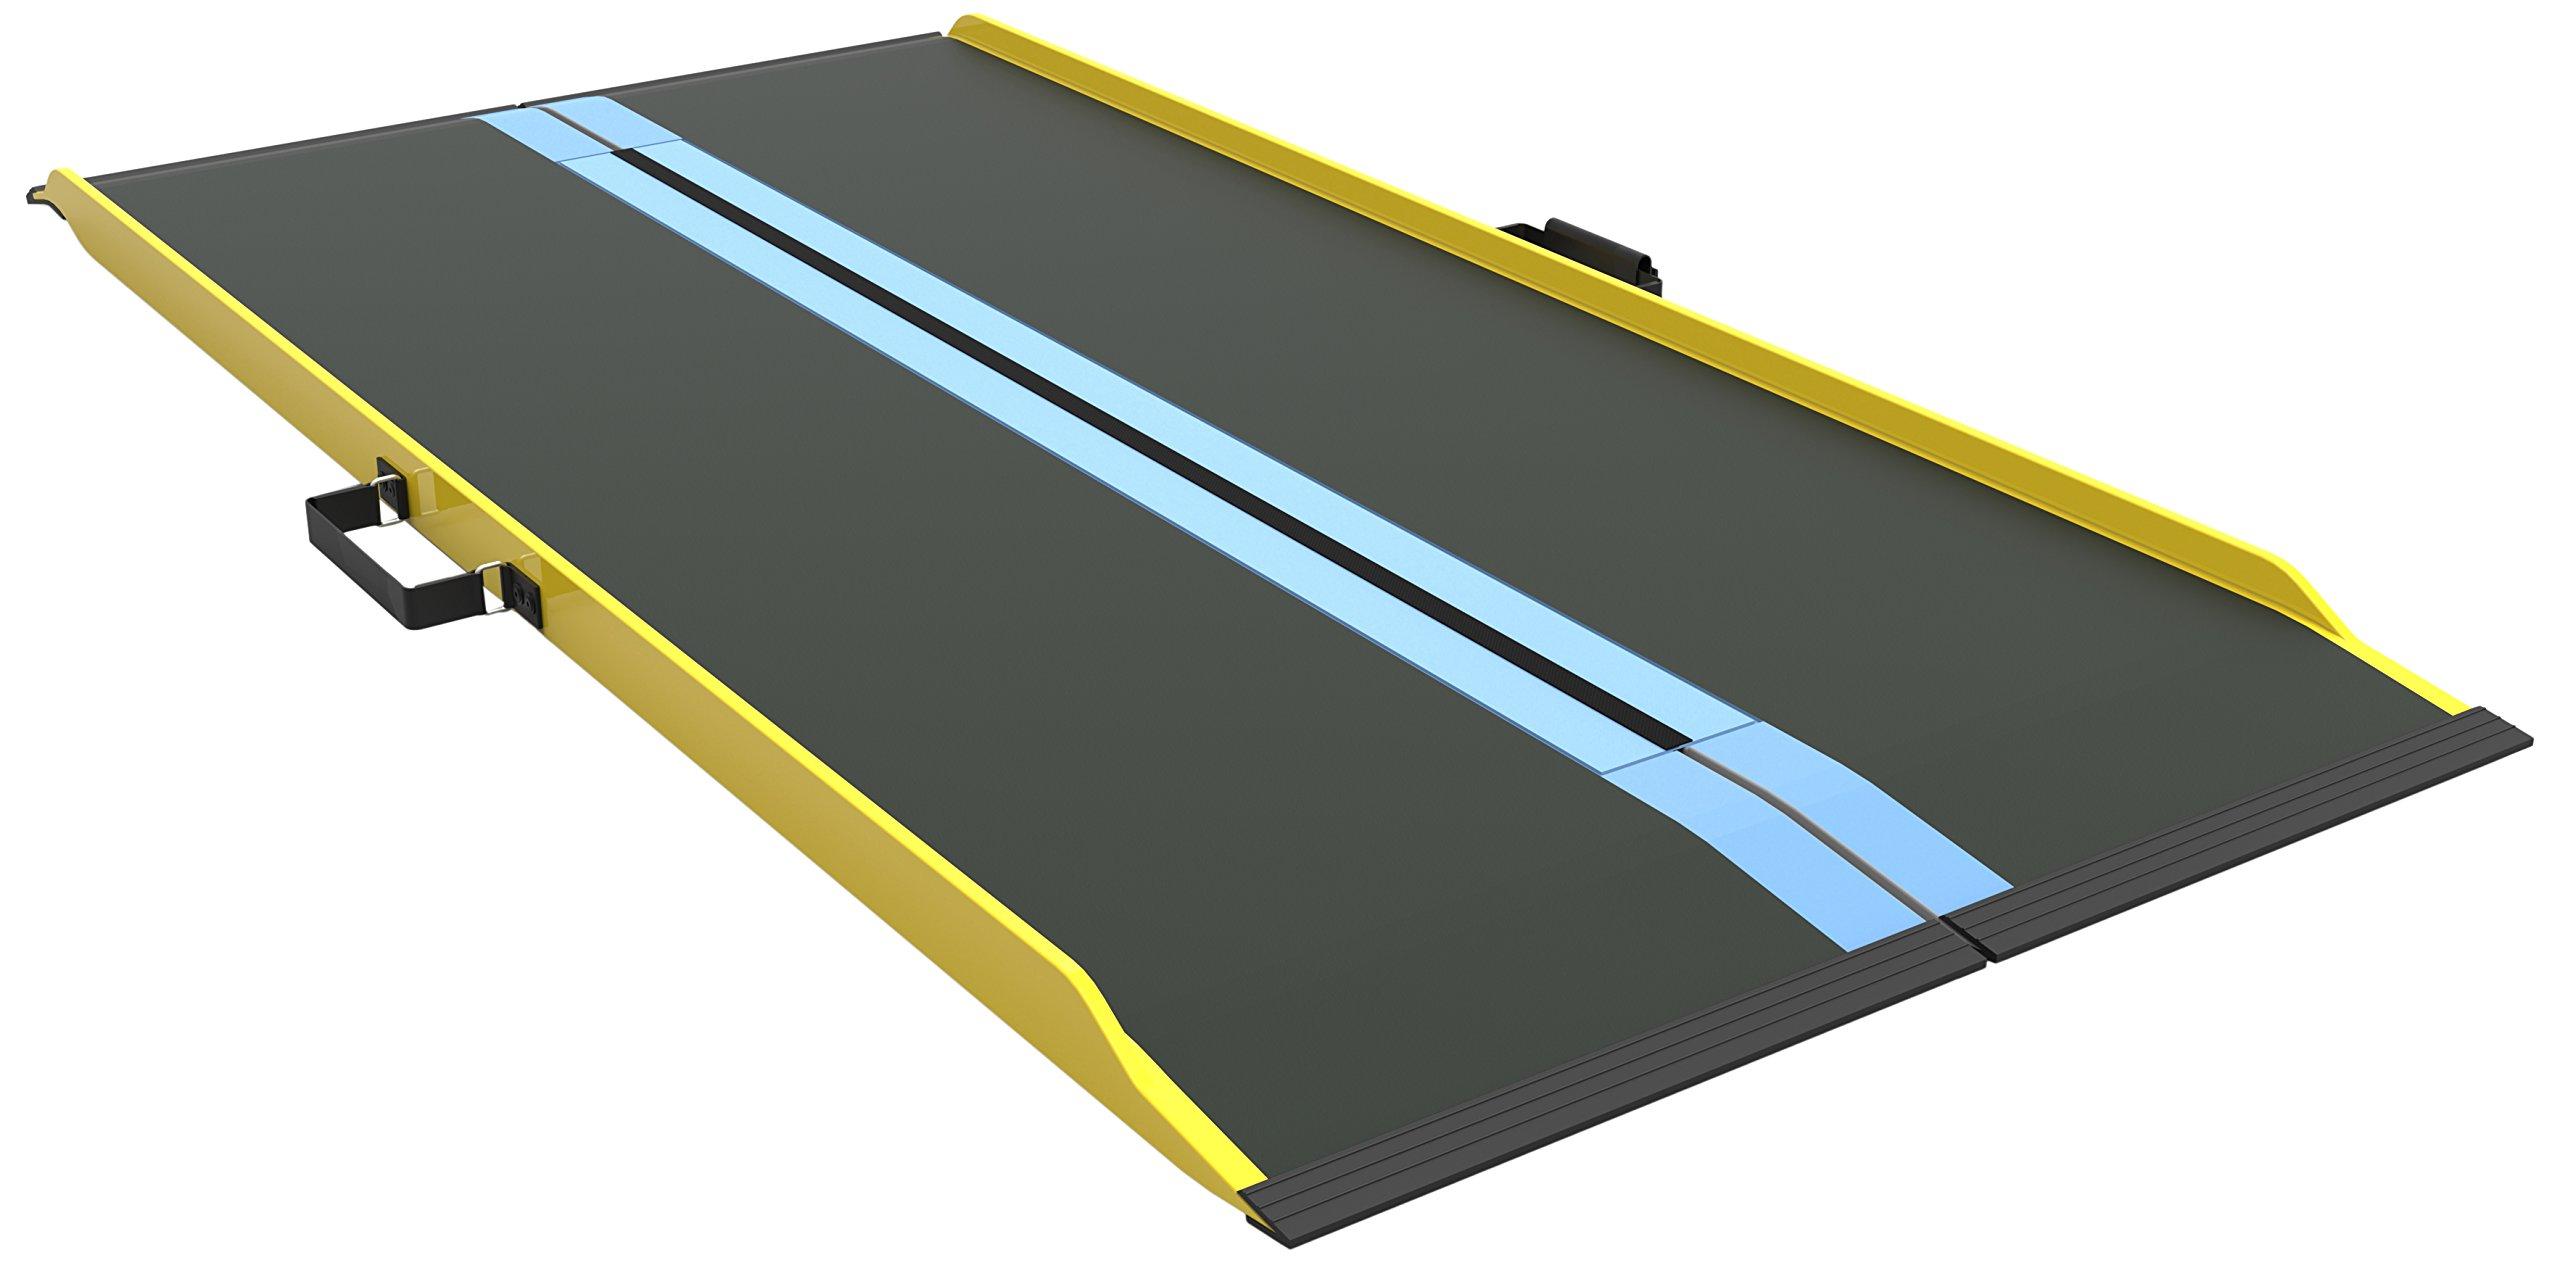 EZ-ACCESS Suitcase Singlefold Graphite Fiber Ramp, 67 Inch, 21 Pound